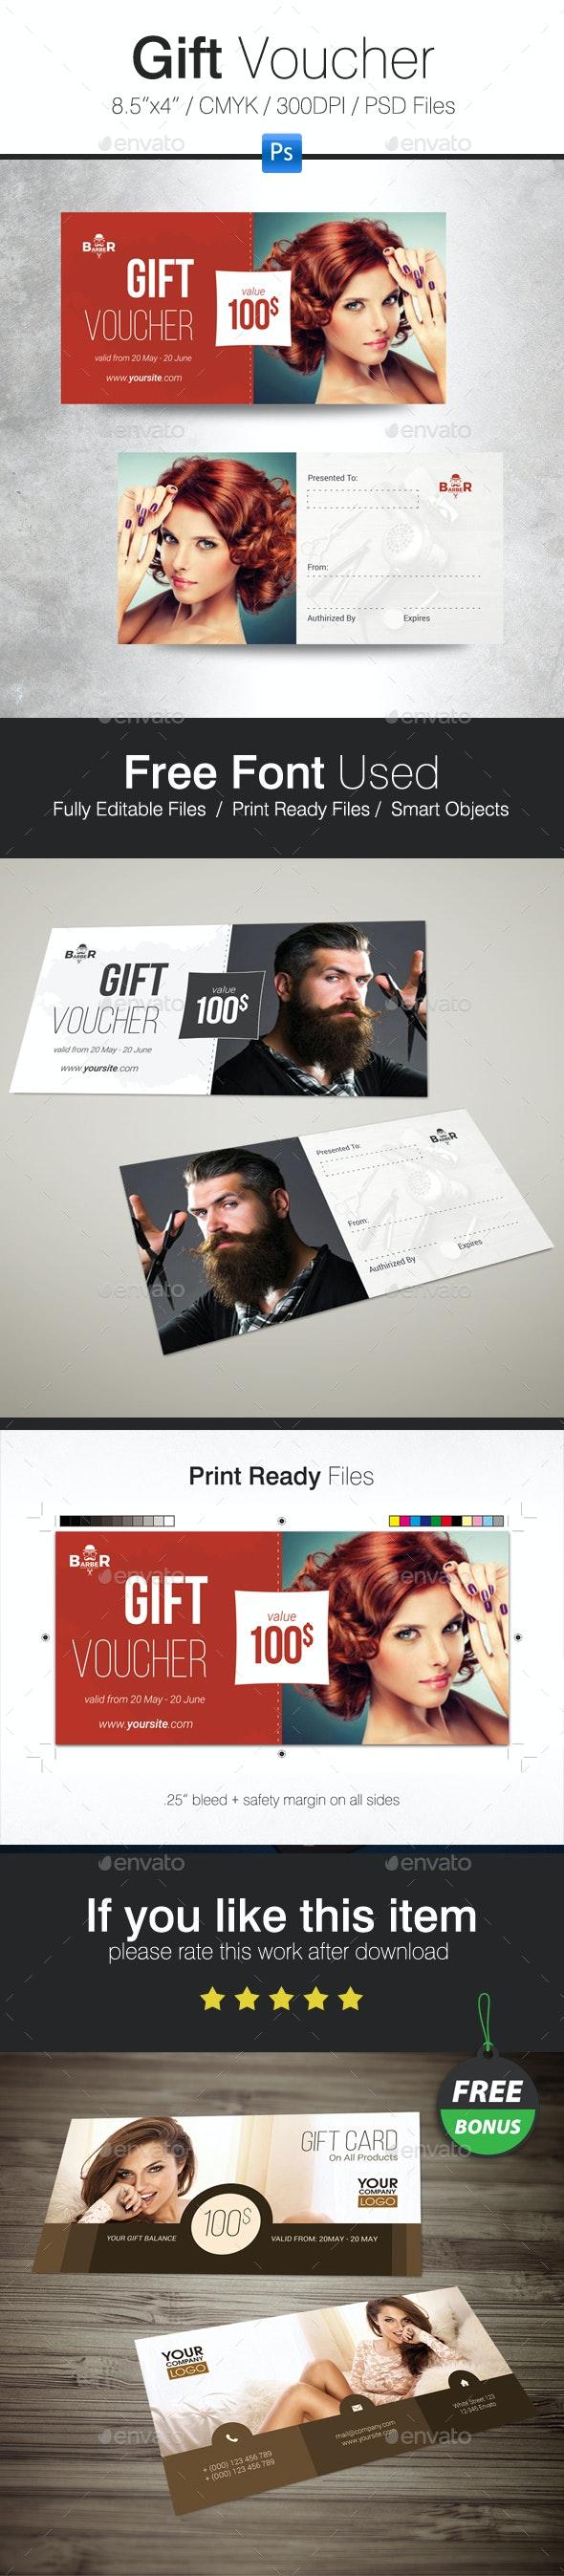 Hairdresser Salon Gift Voucher - Cards & Invites Print Templates